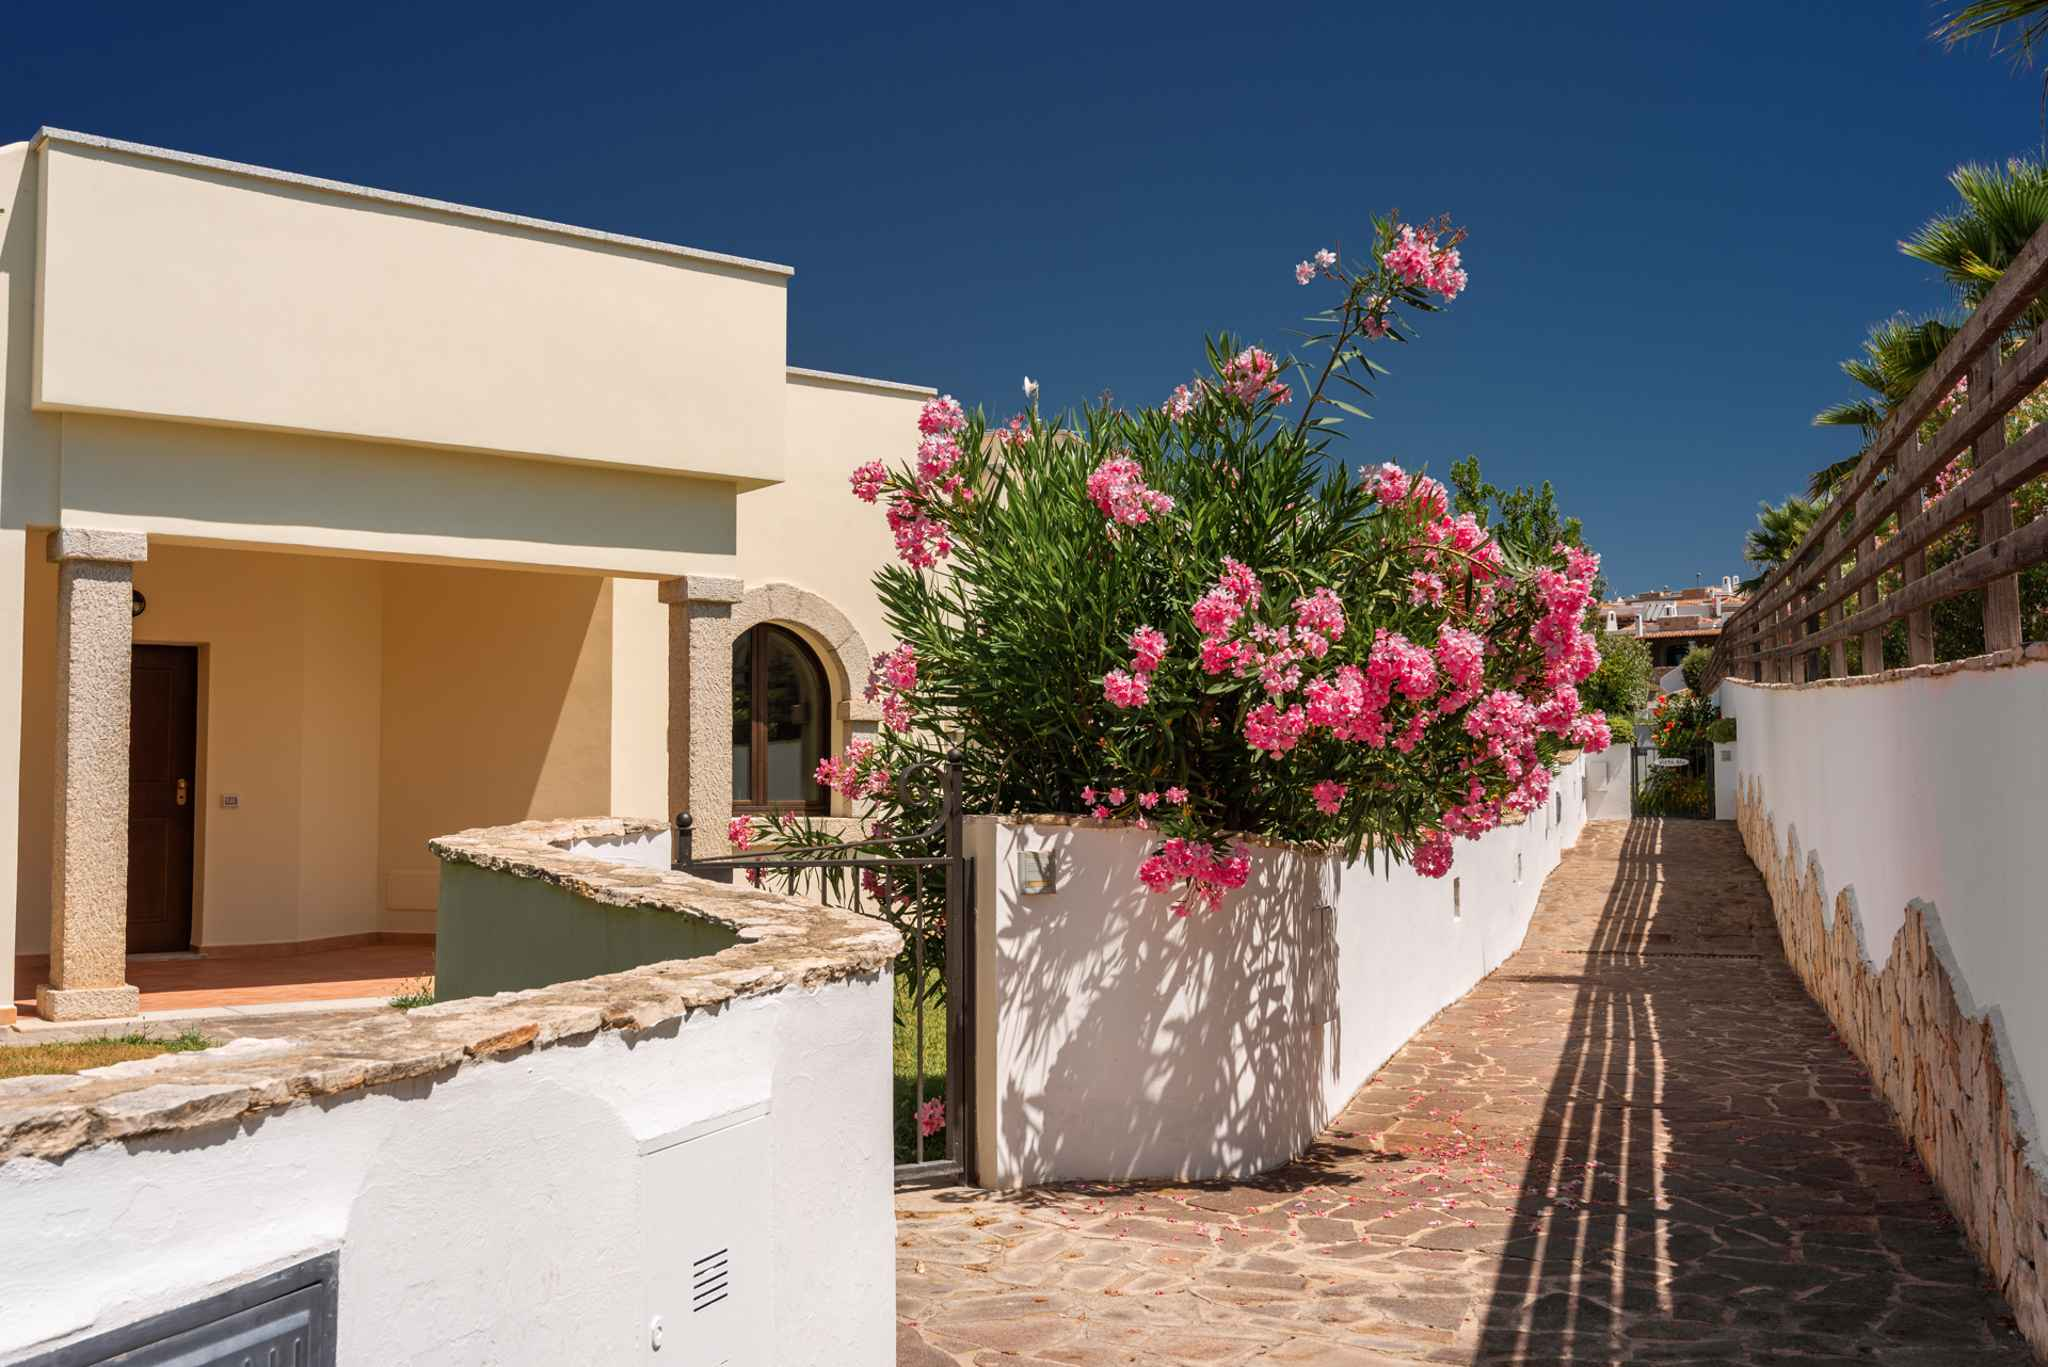 Ferienhaus con giardino (2182422), Alghero, Sassari, Sardinien, Italien, Bild 3